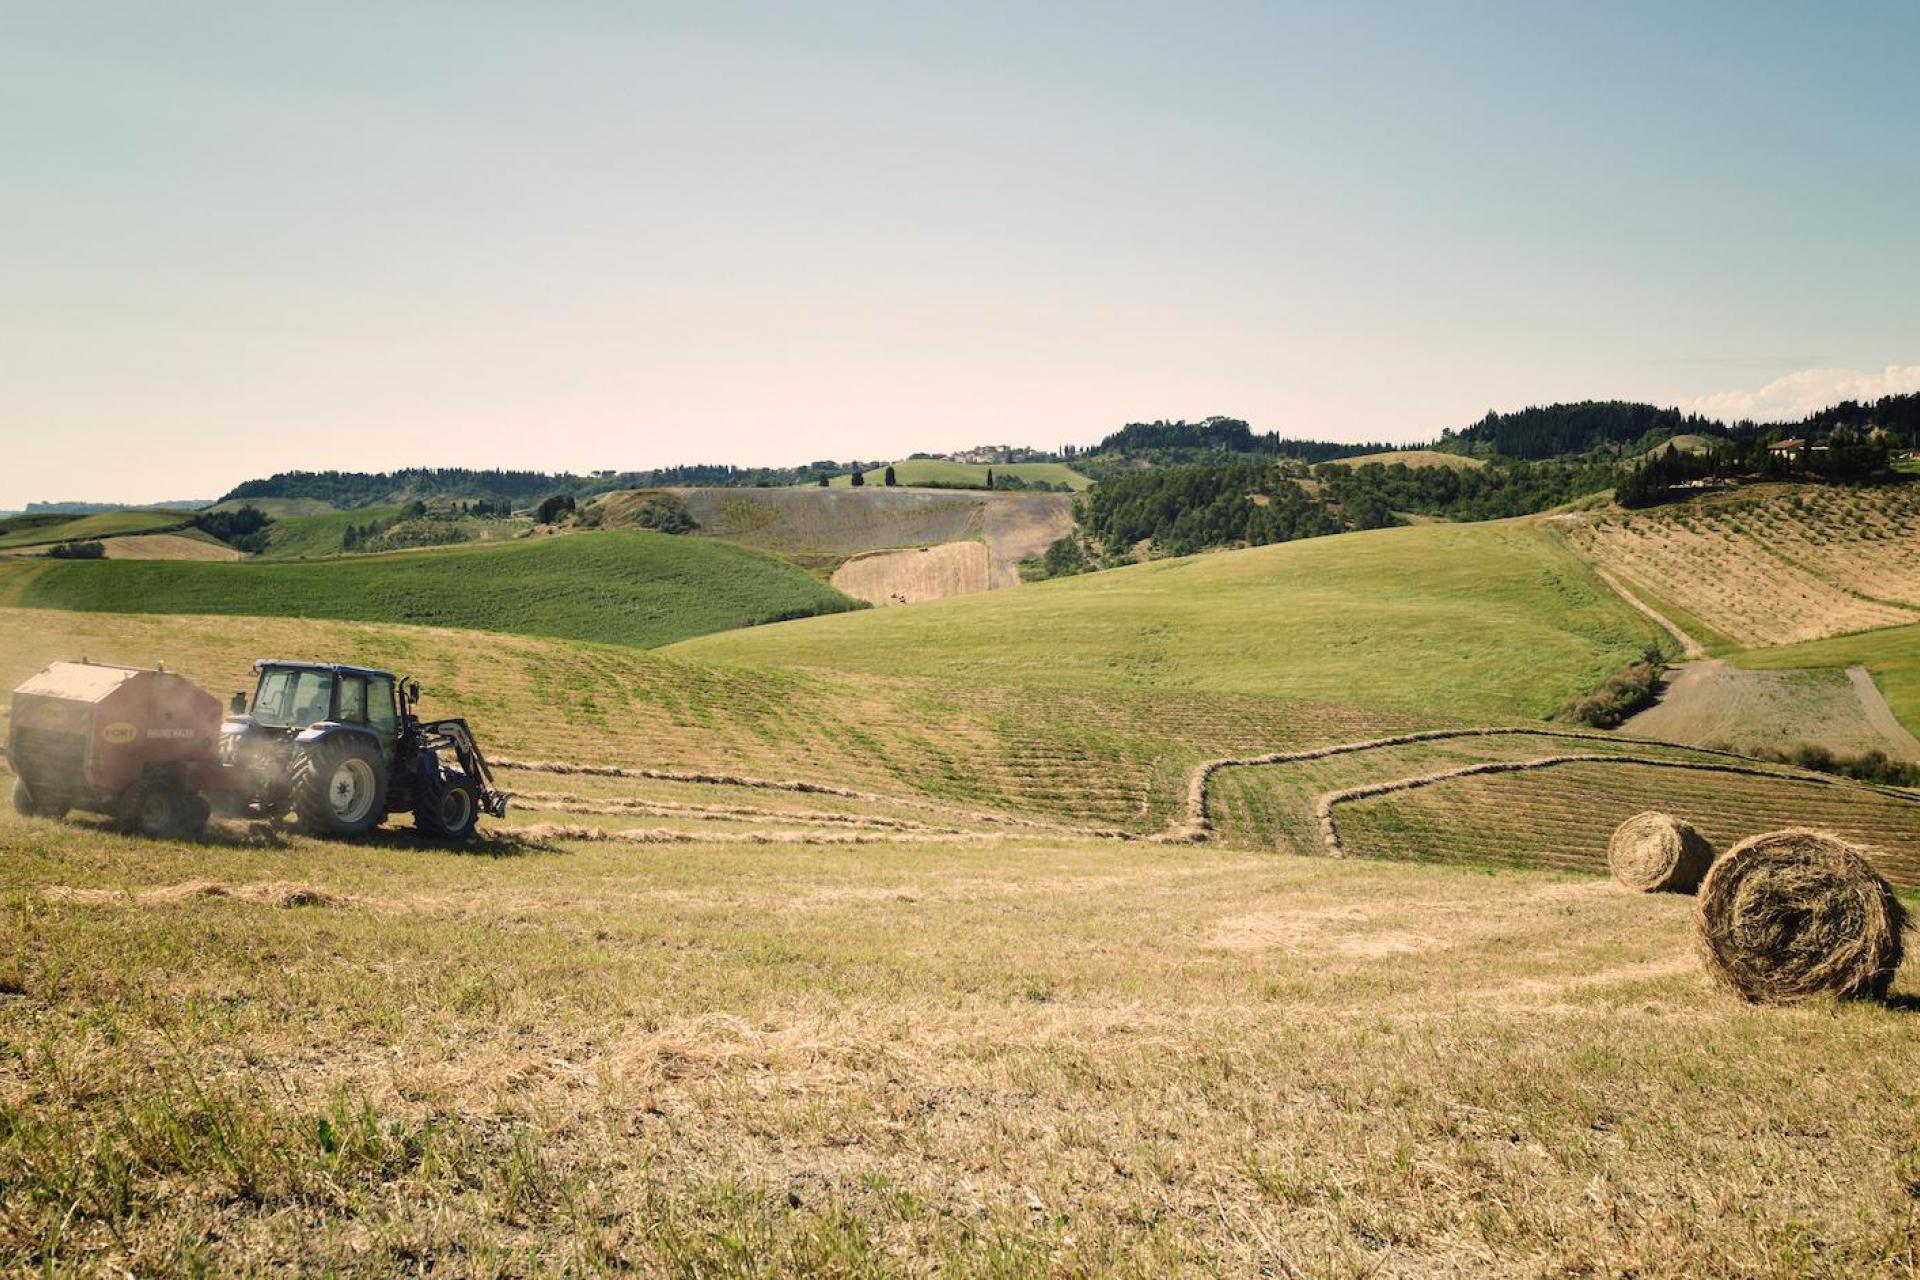 Agriturismo Toskana Agriturismo Toskana mit grandiosem Blick